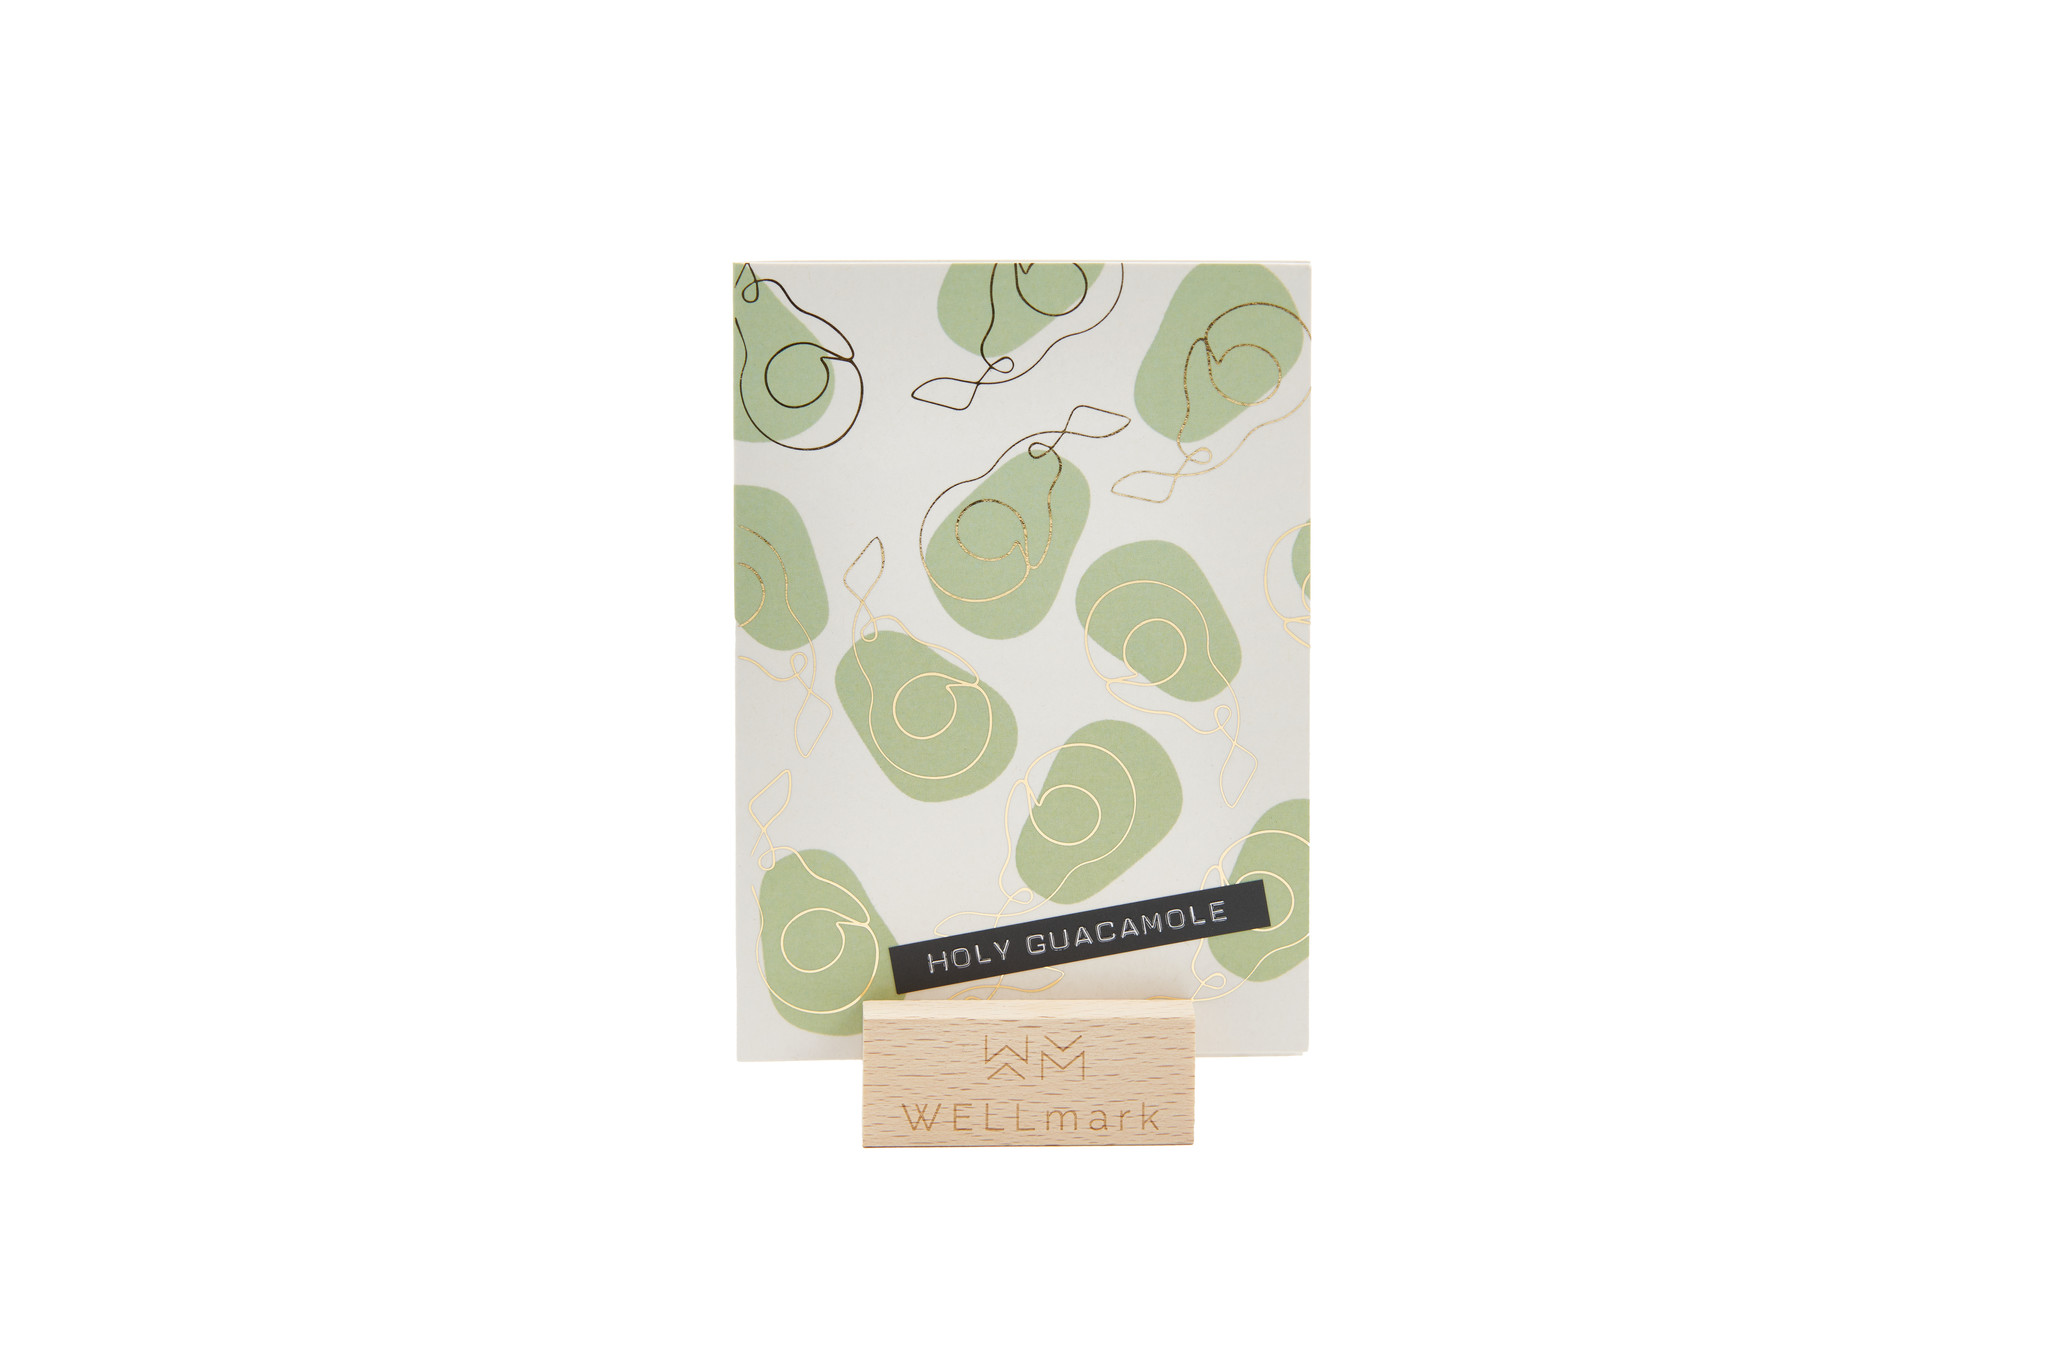 Postcard Gold design recycled avocado 'holy guacamole'-1